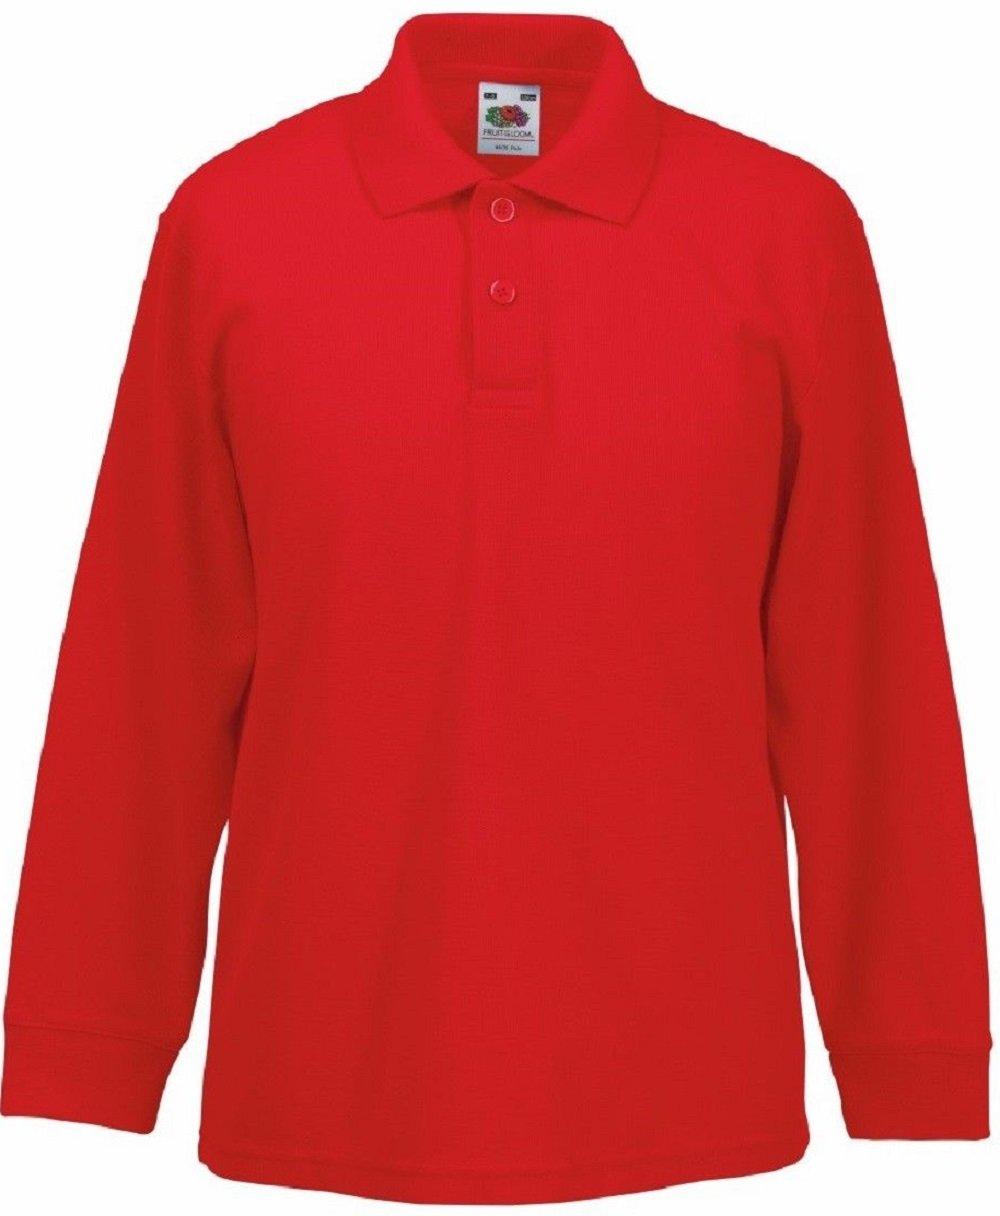 Absab Ltd 3 Pack FOTL Childrens Long Sleeve School Wear Uniform Kids Plain Polo Shirt SS45B